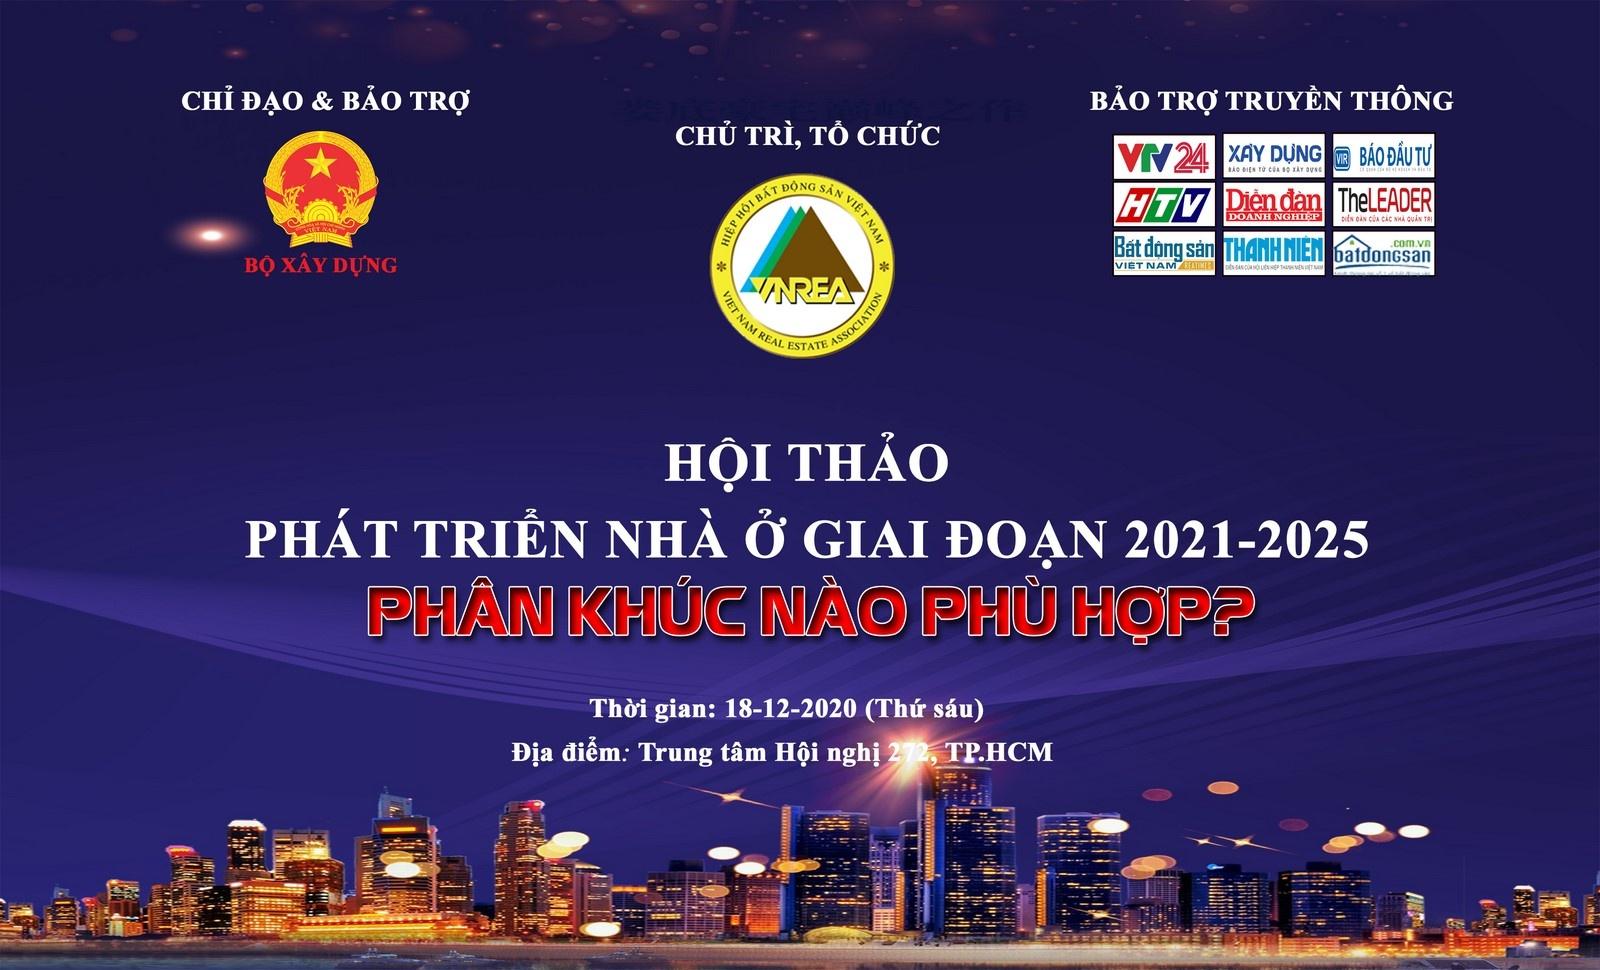 sap dien ra hoi thao phat trien nha o giai doan 2021 2025 phan khuc nao phu hop